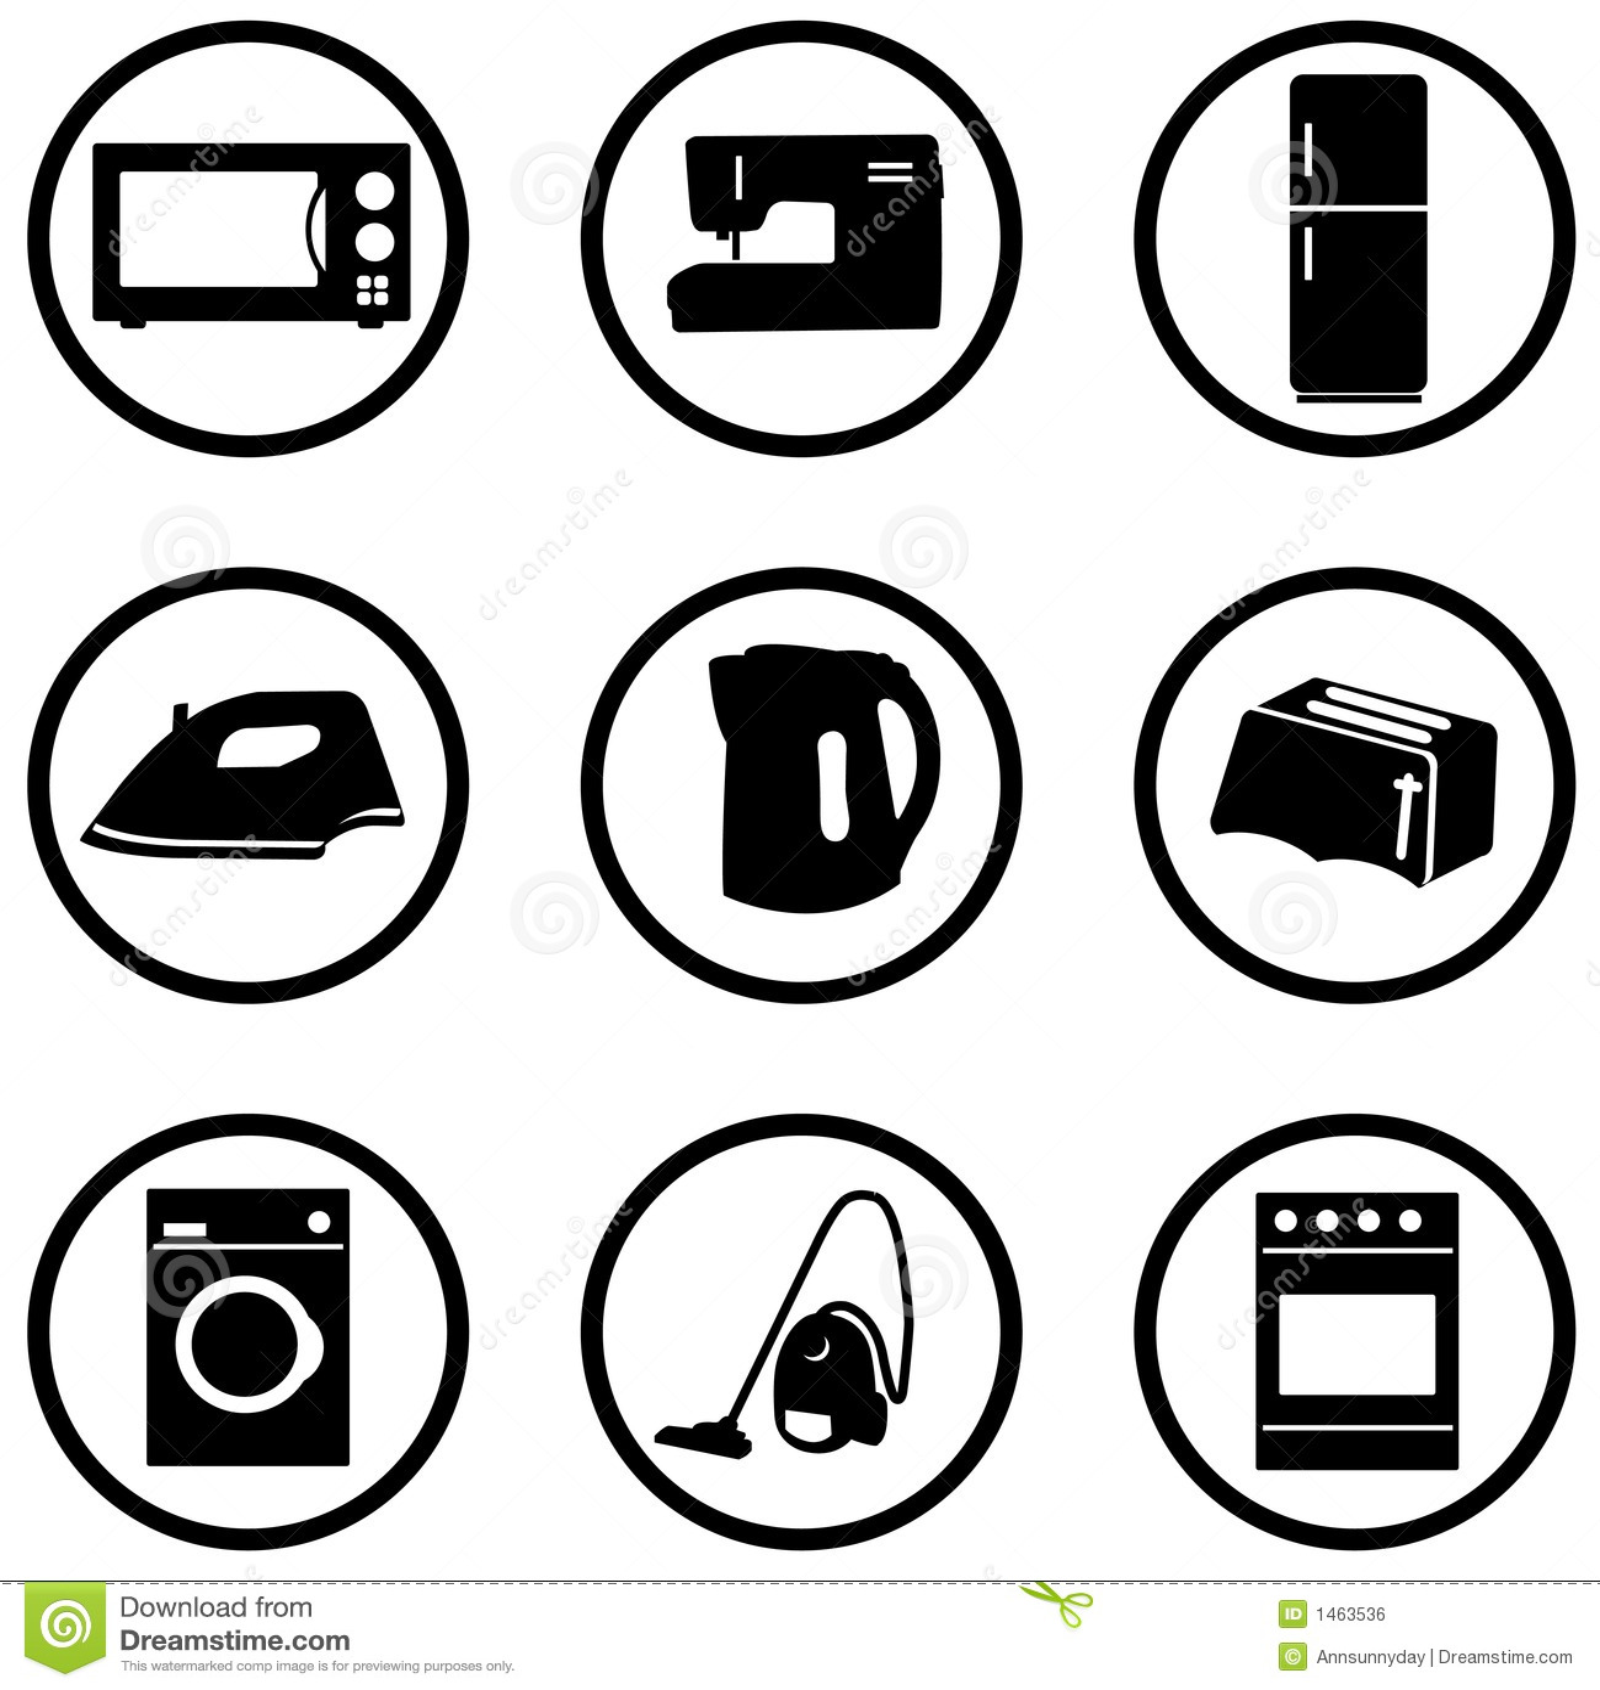 graphismes d 39 appareil m nager r gl s image libre de droits image 1463536. Black Bedroom Furniture Sets. Home Design Ideas